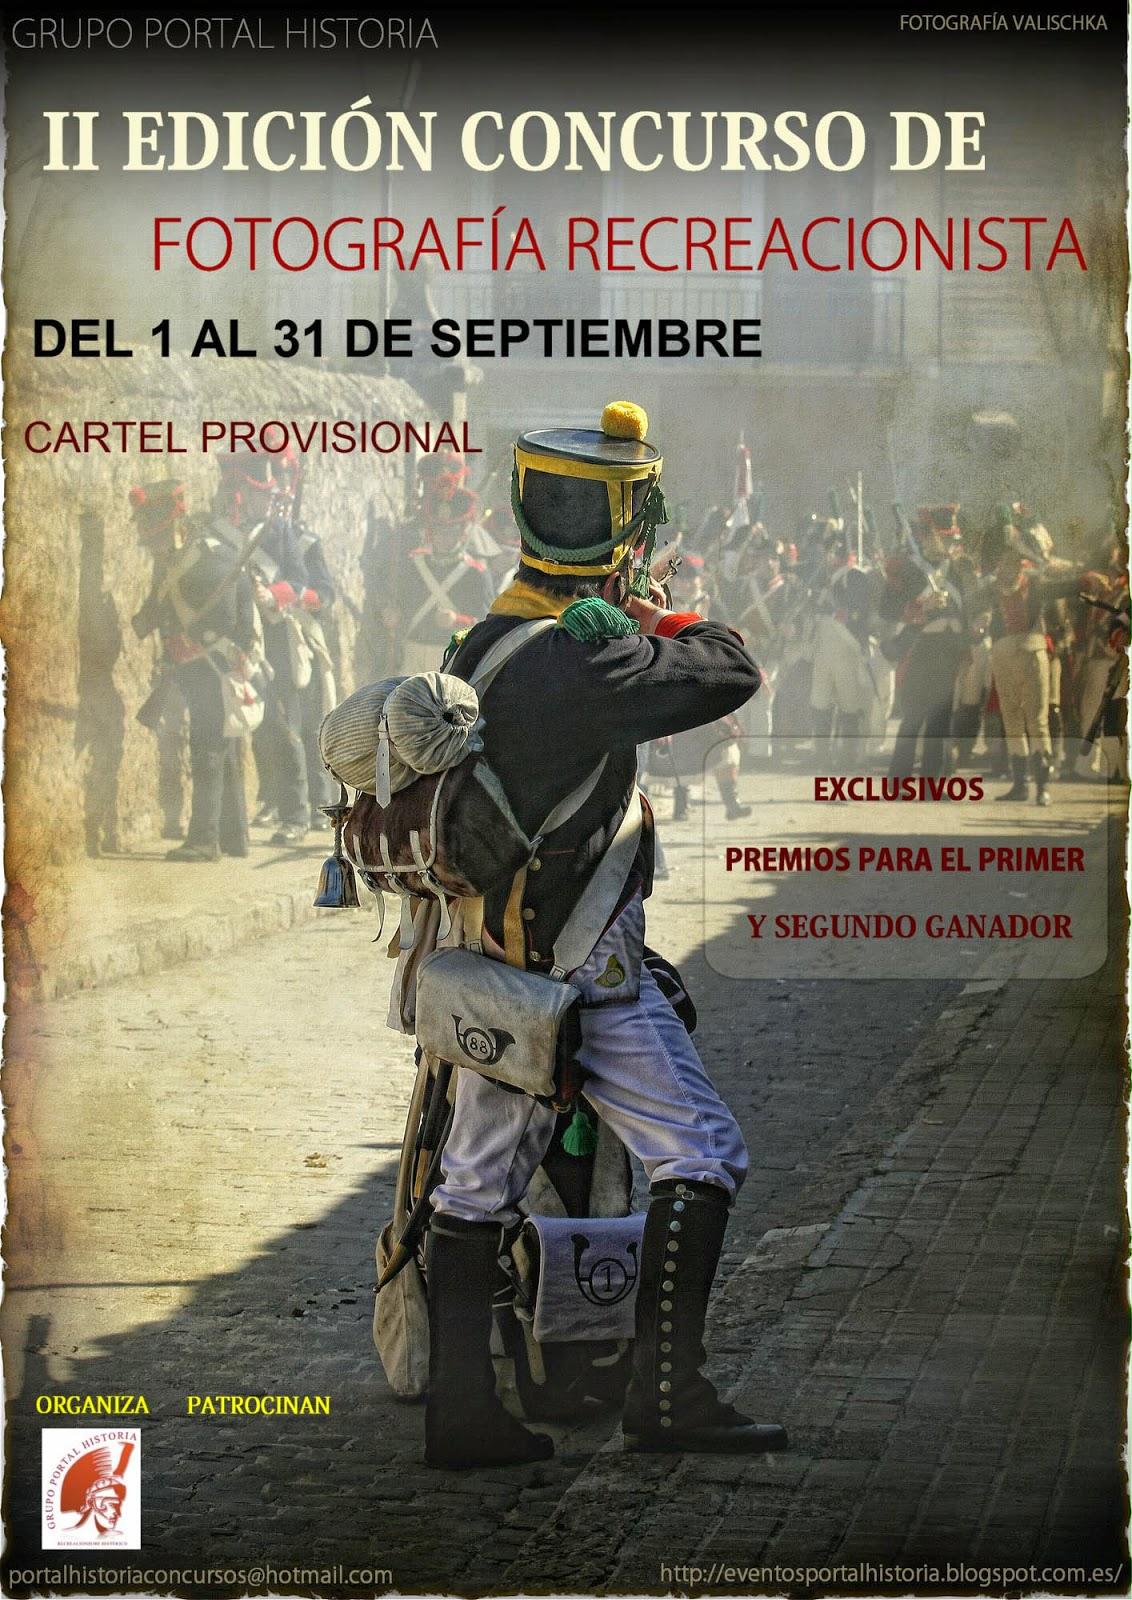 http://eventosportalhistoria.blogspot.com.es/2014/05/ii-edicion-concurso-de-fotografia.html